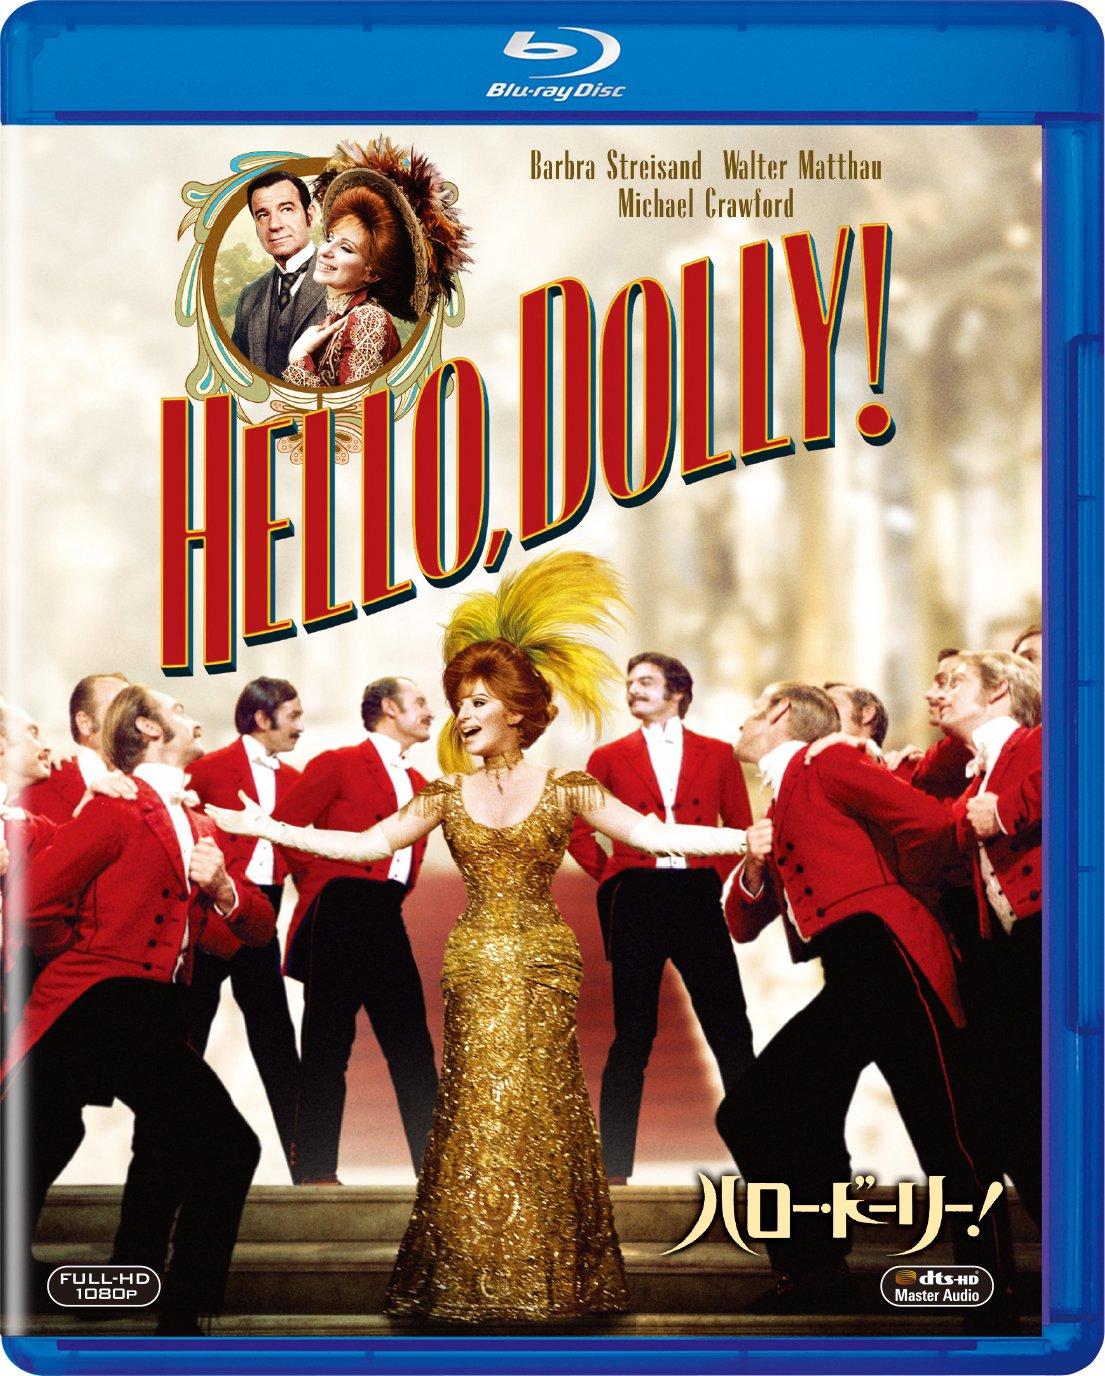 [MOVIES] ハロー・ドーリー! / Hello, Dolly! (1969) (BDREMUX)